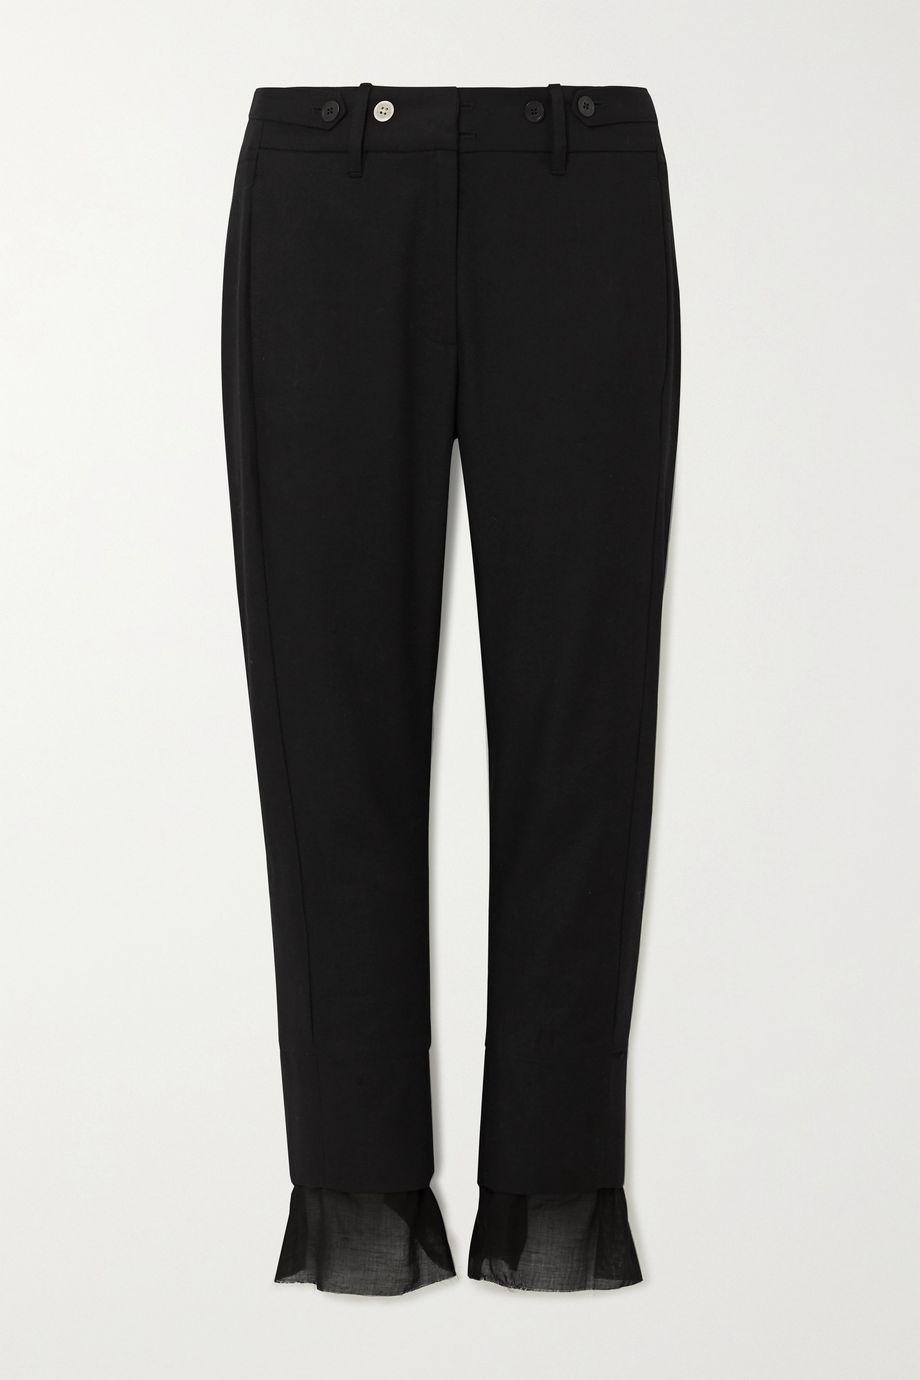 Ann Demeulemeester Cotton and cashmere-blend slim-leg pants